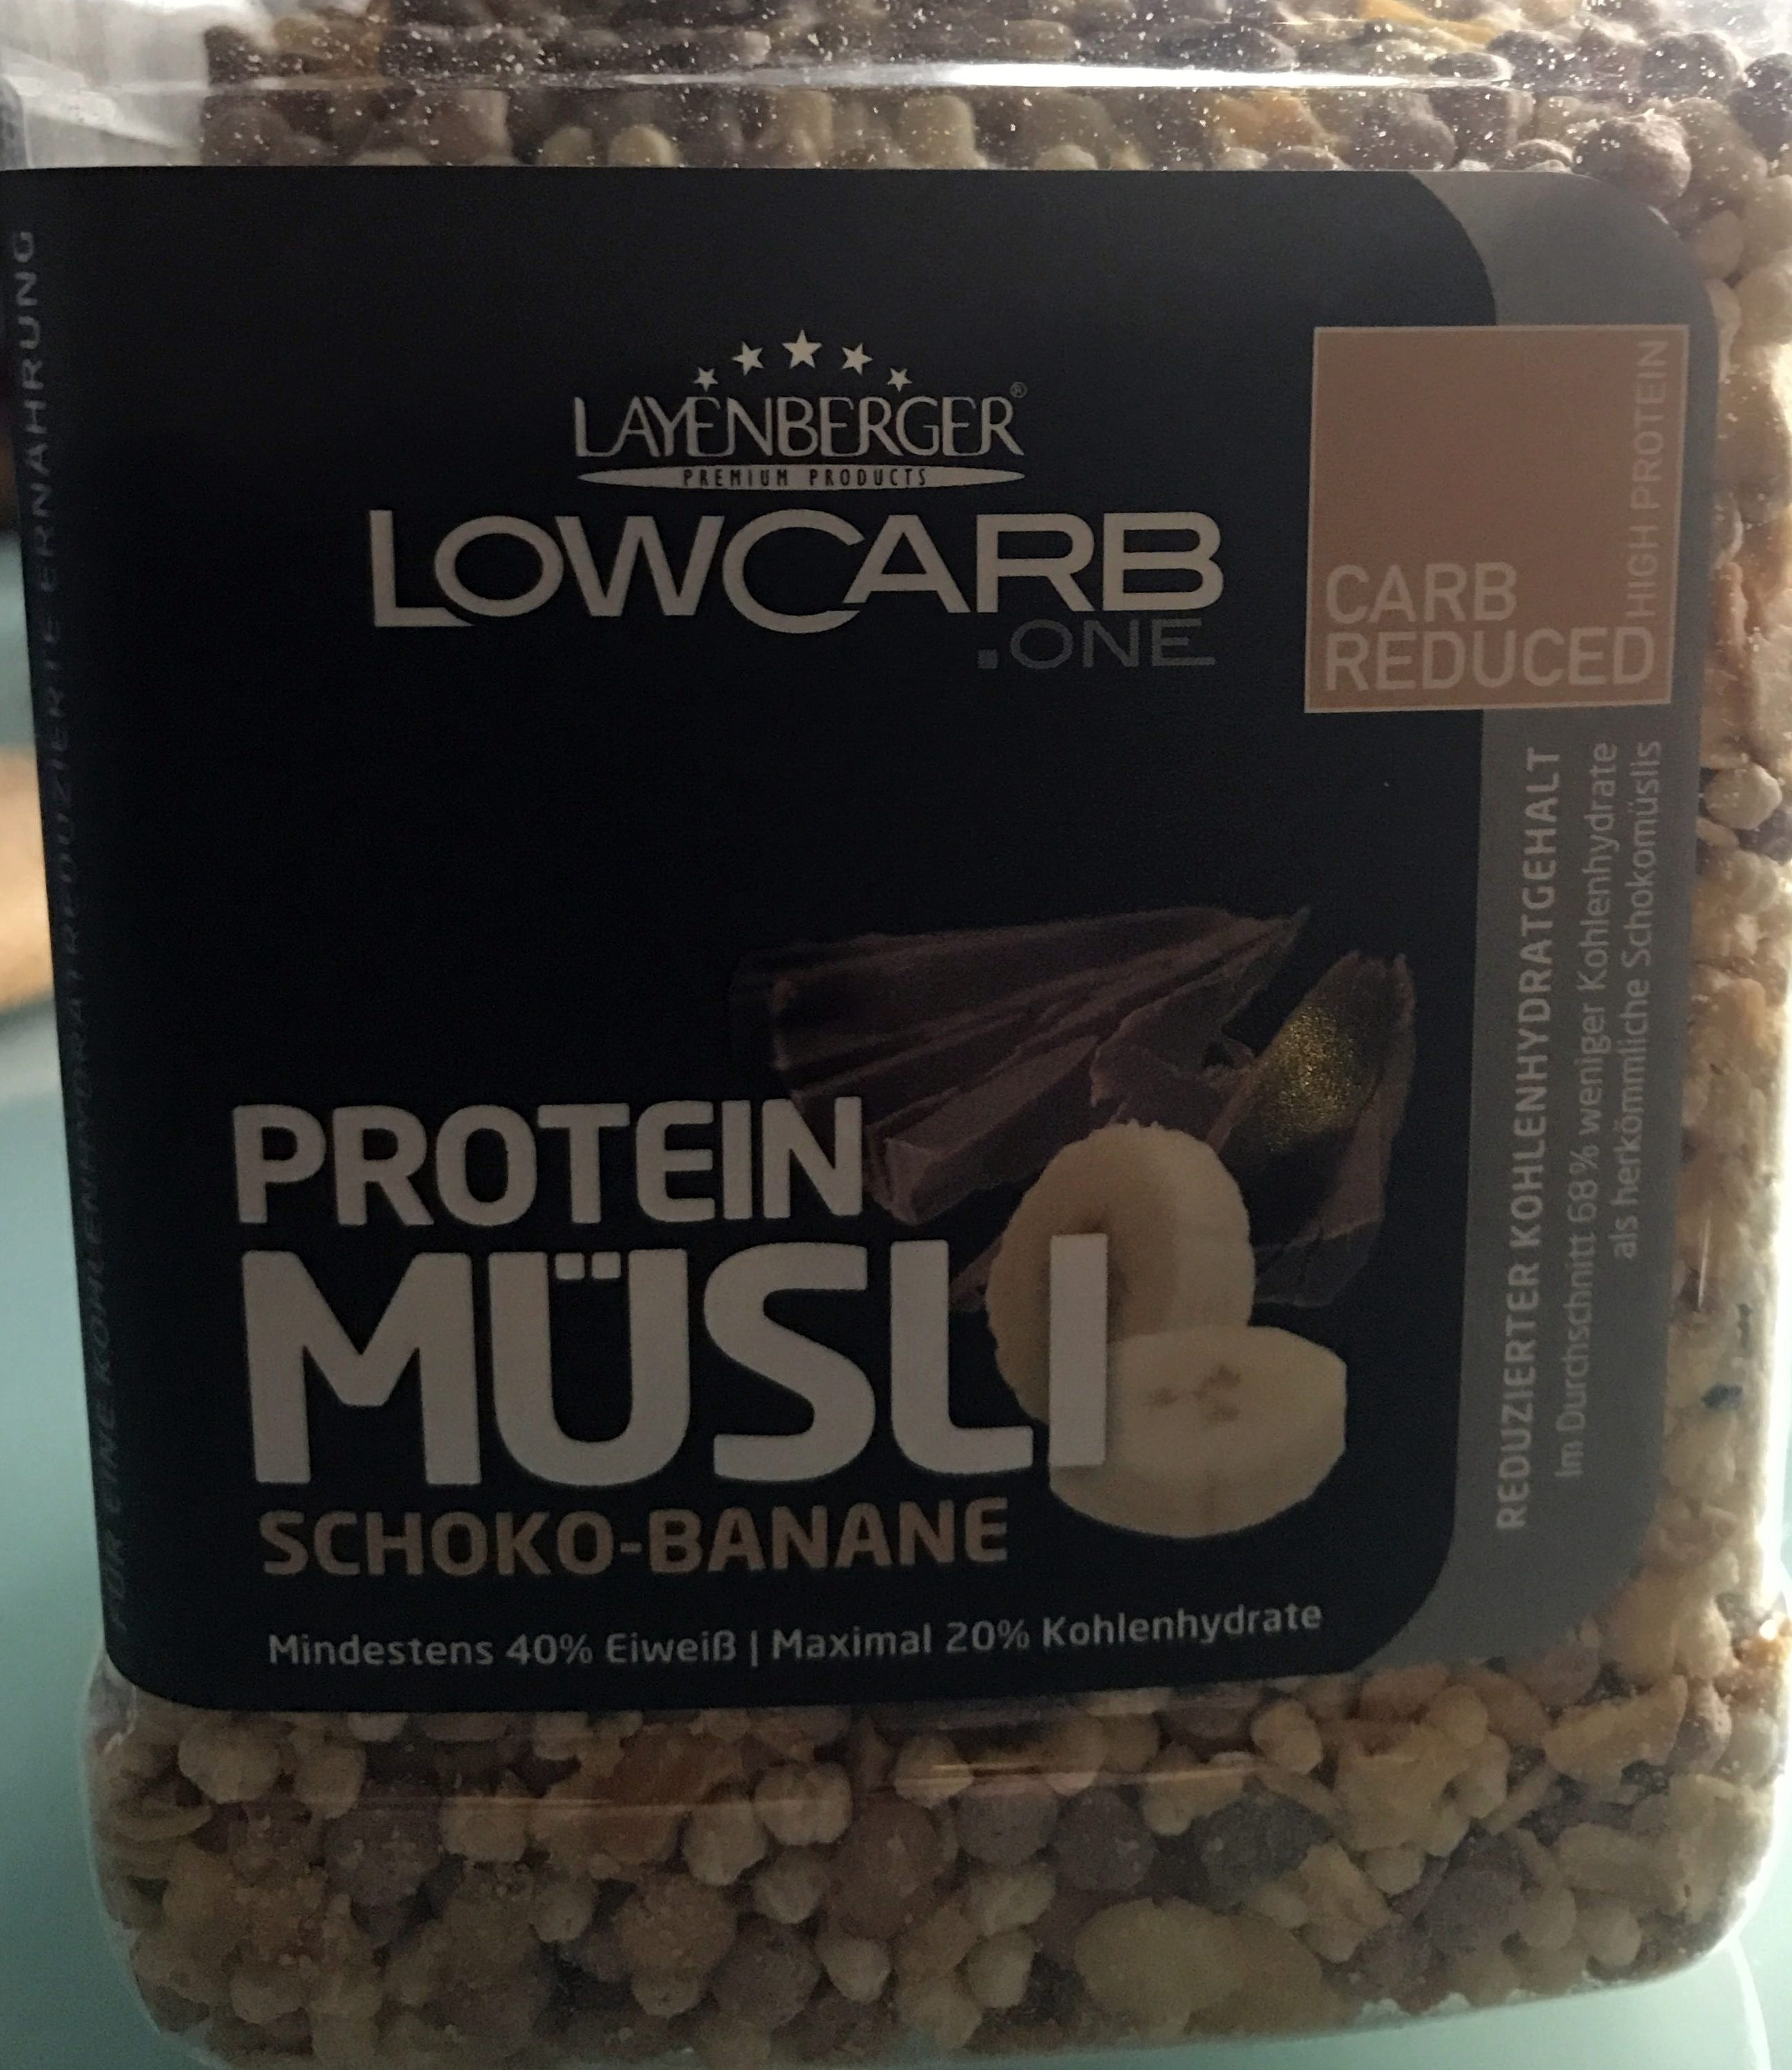 Protein müsli [choco-banane] - Product - fr